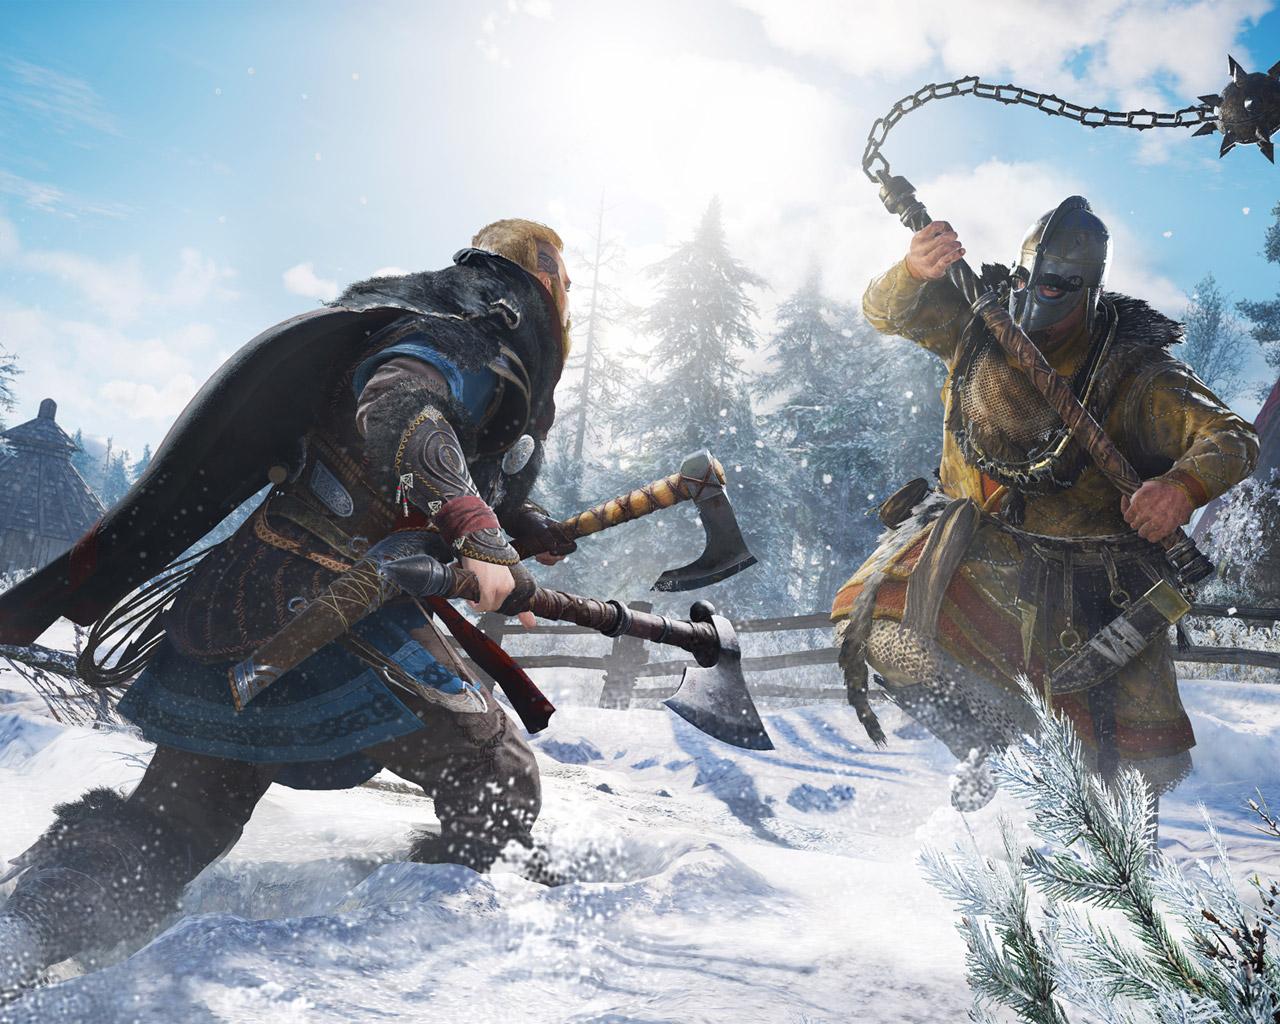 Assassin's Creed Valhalla Wallpaper in 1280x1024